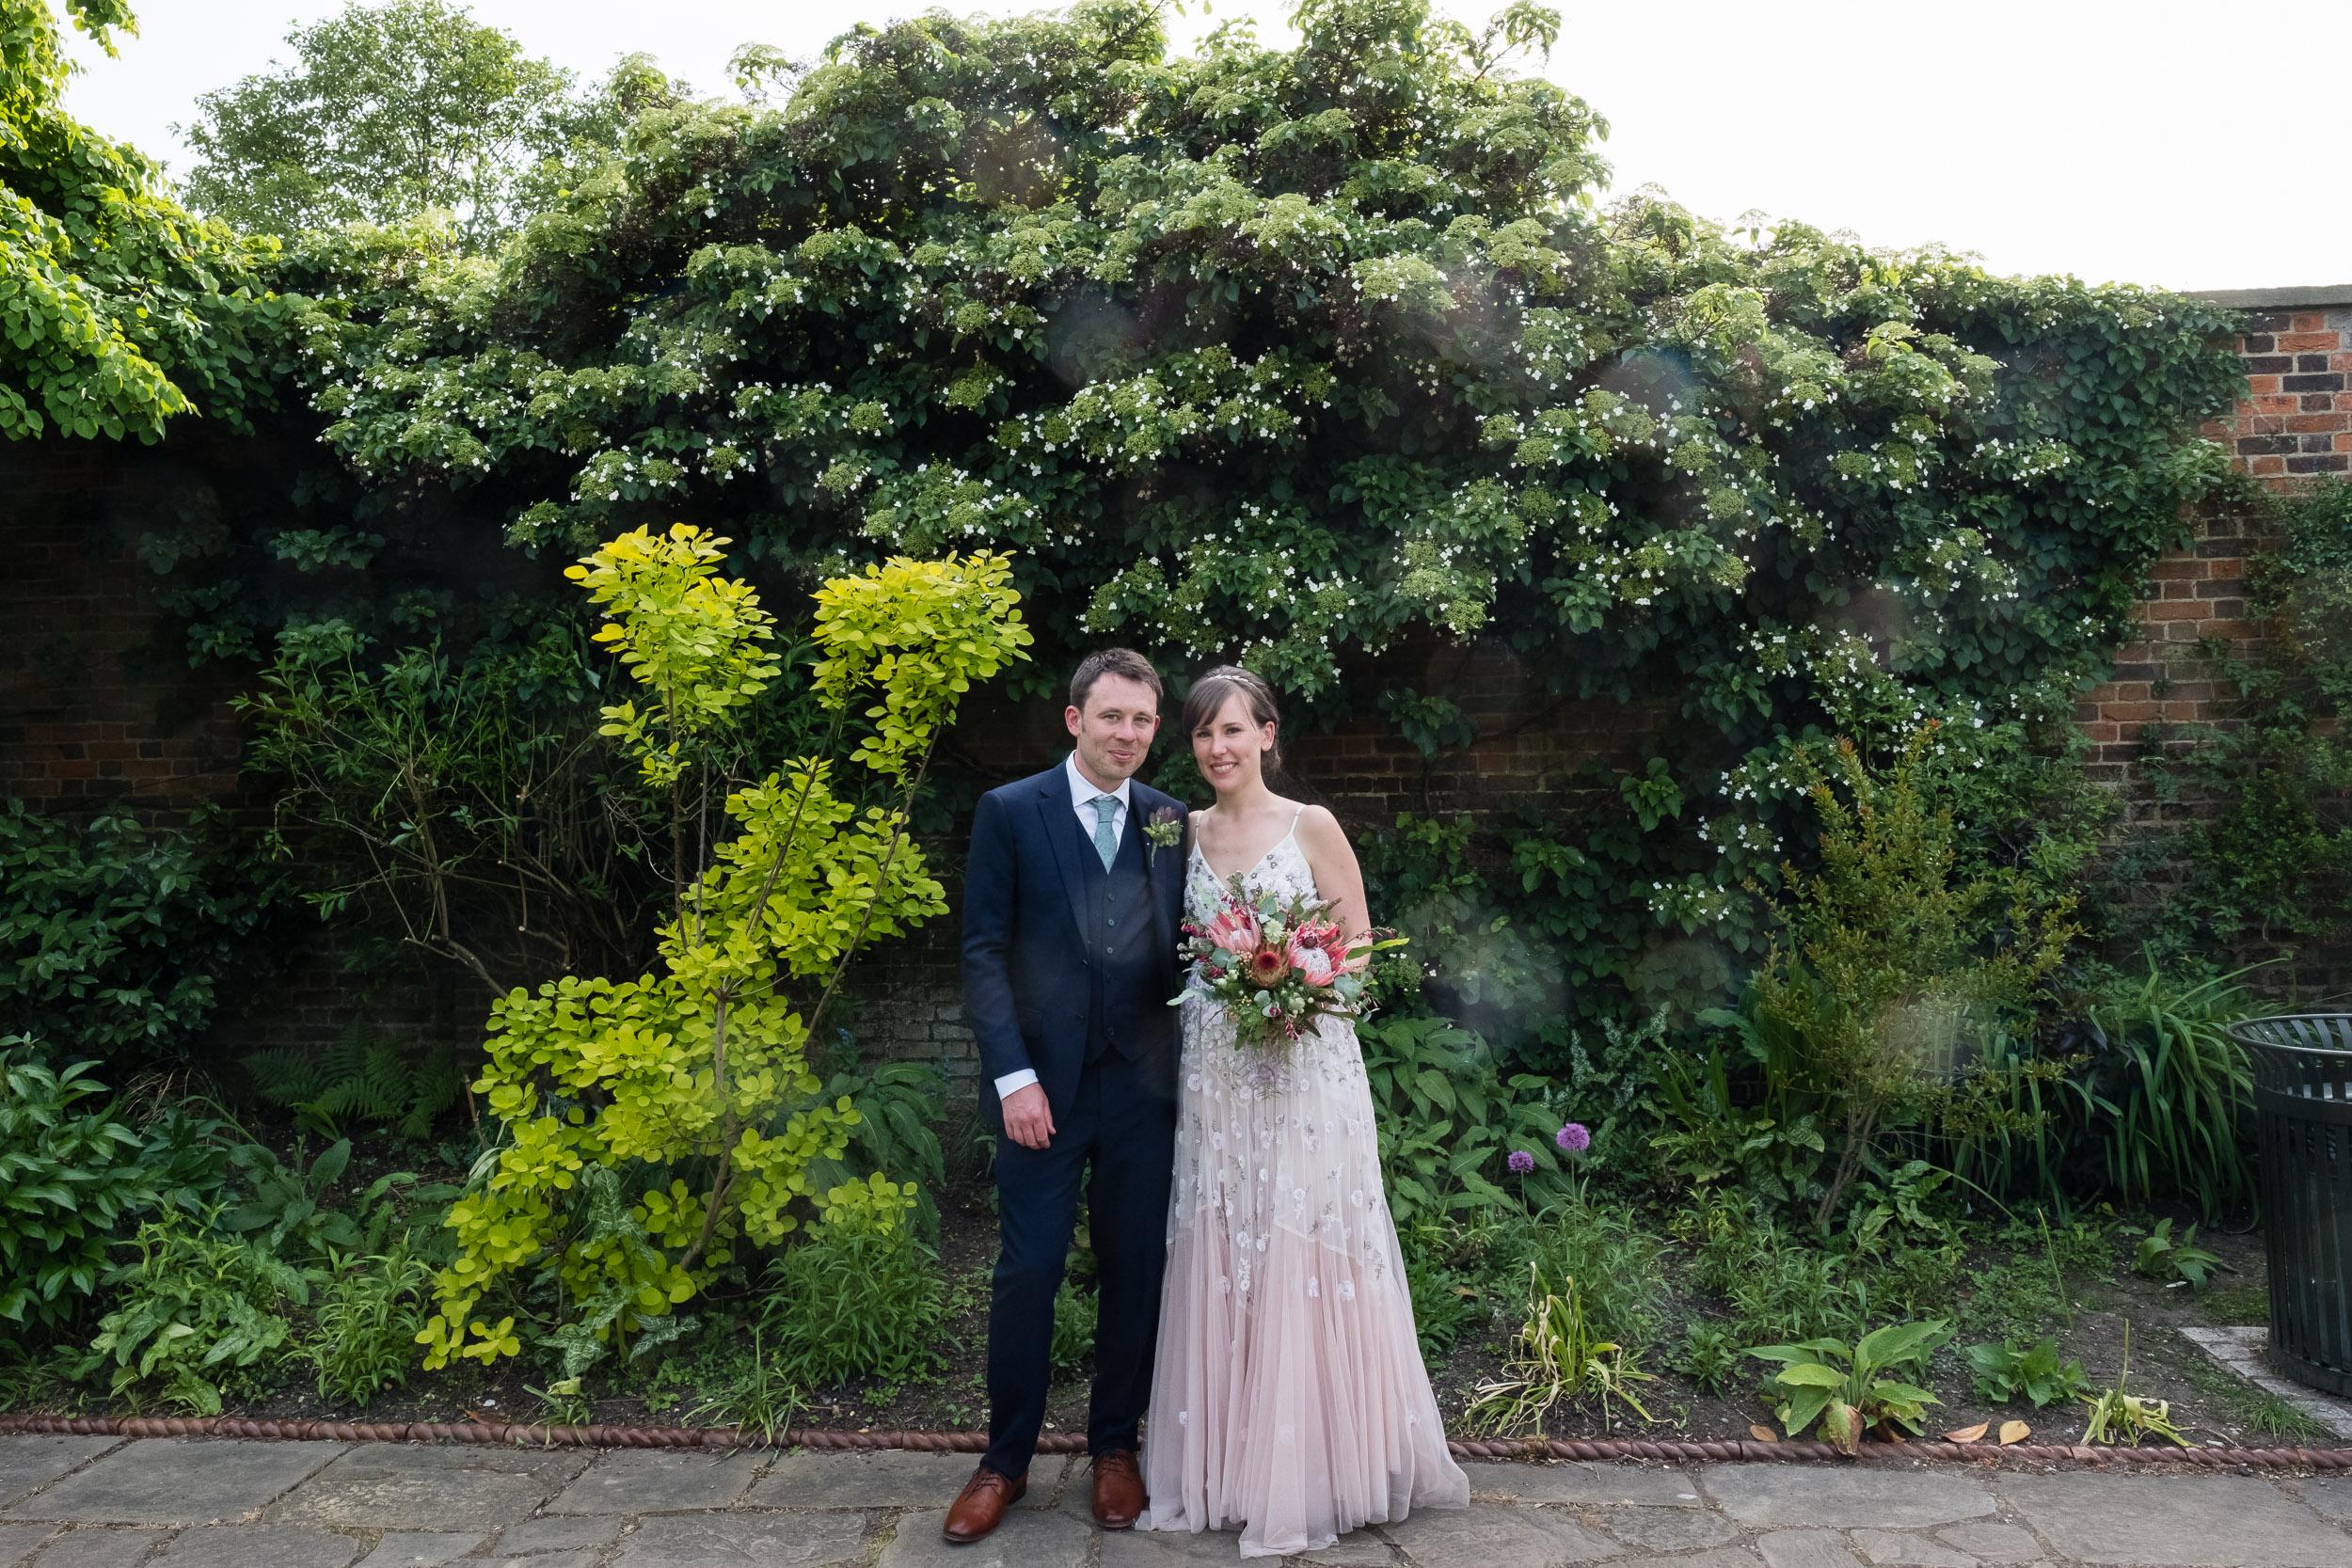 brockwell-lido-brixton-herne-hill-wedding-283.jpg